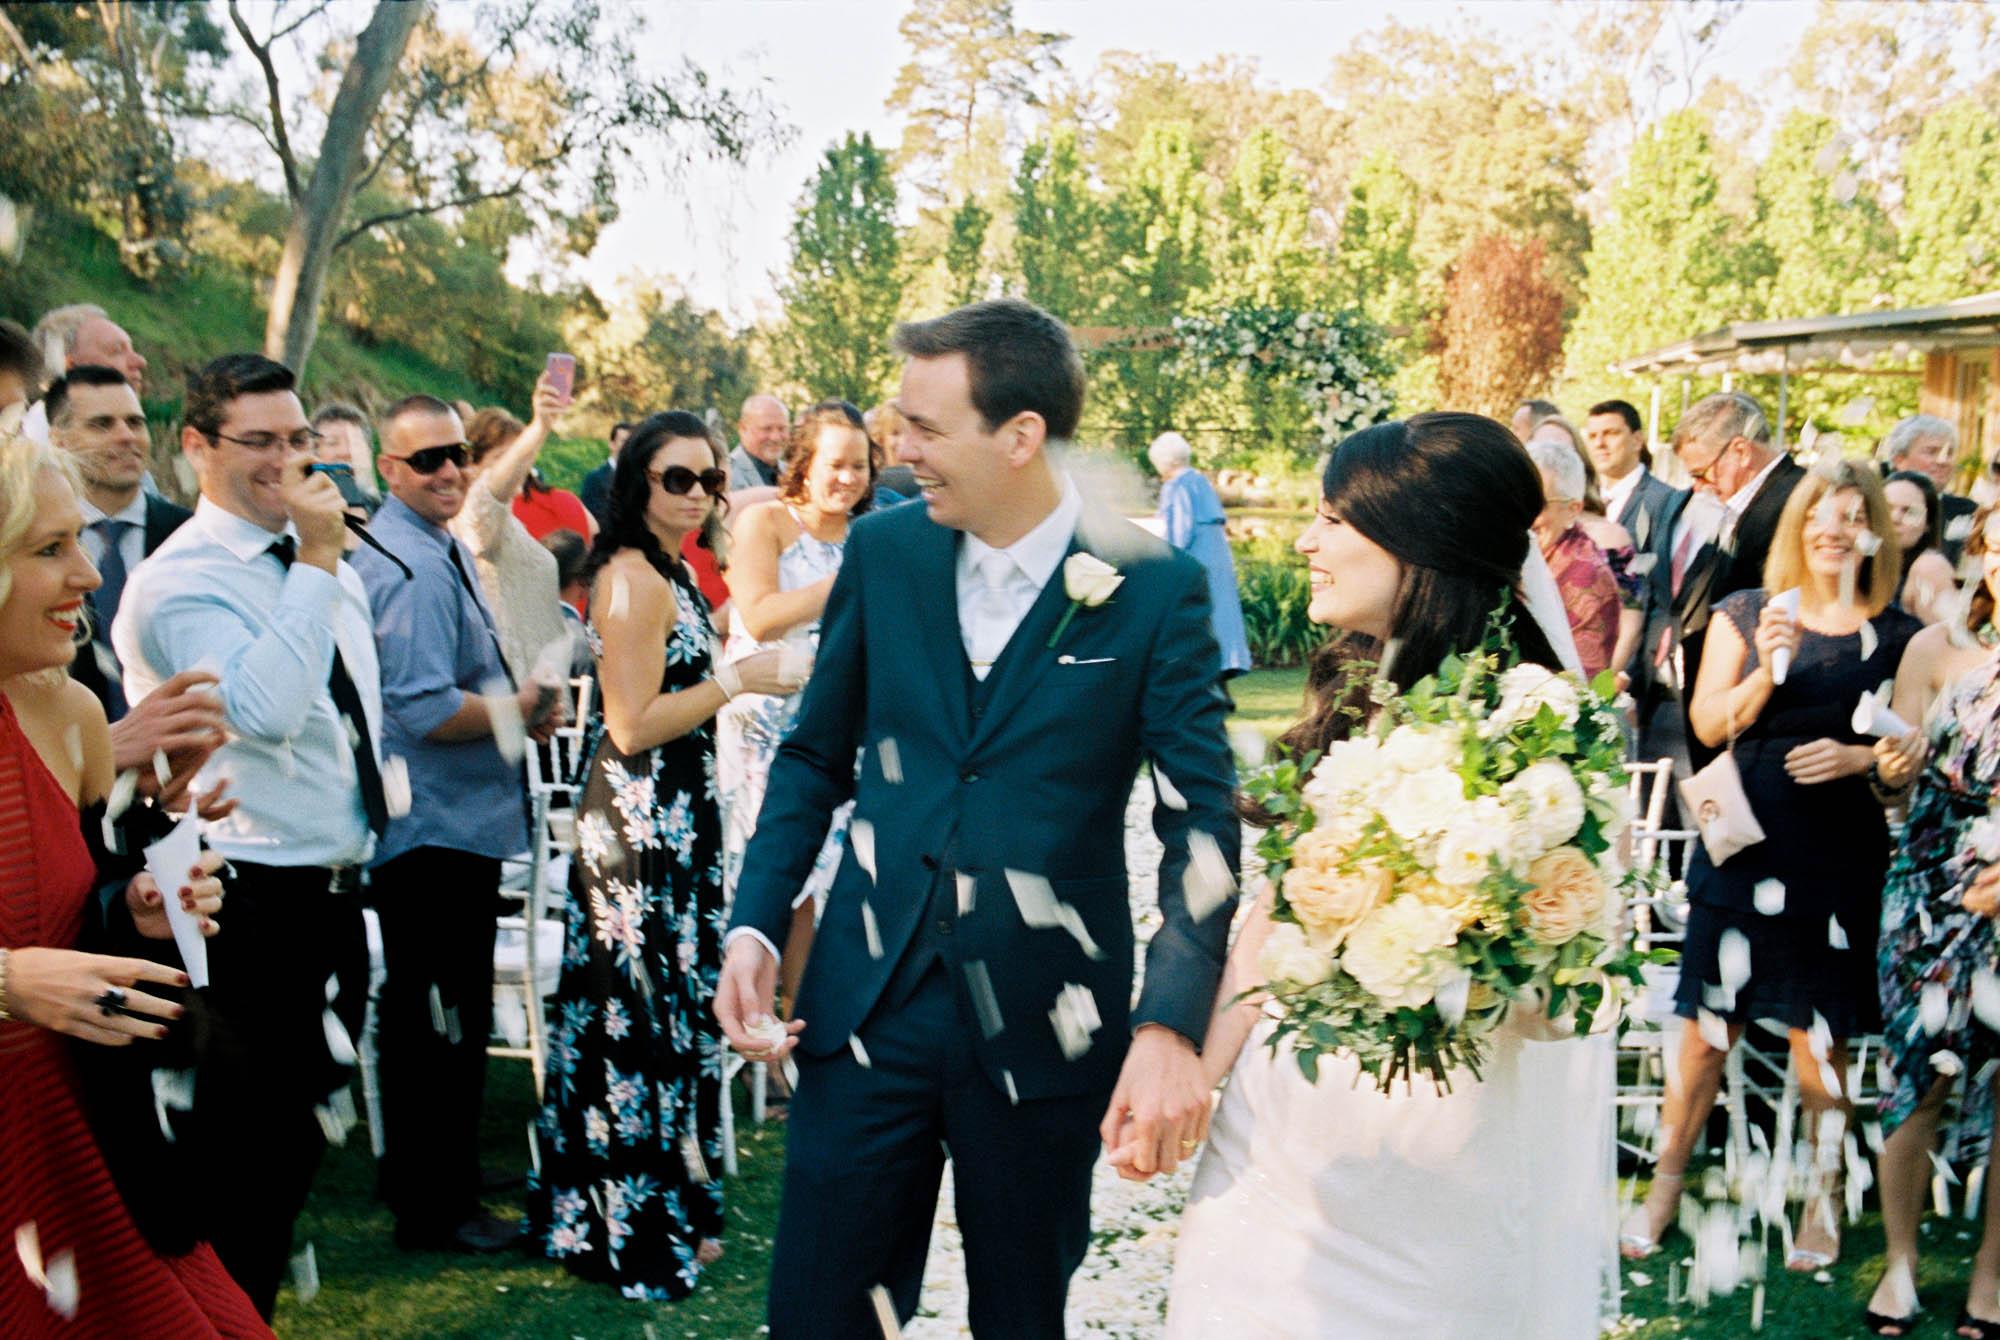 Glen-Ewin-Estate-wedding-photography-048.jpg